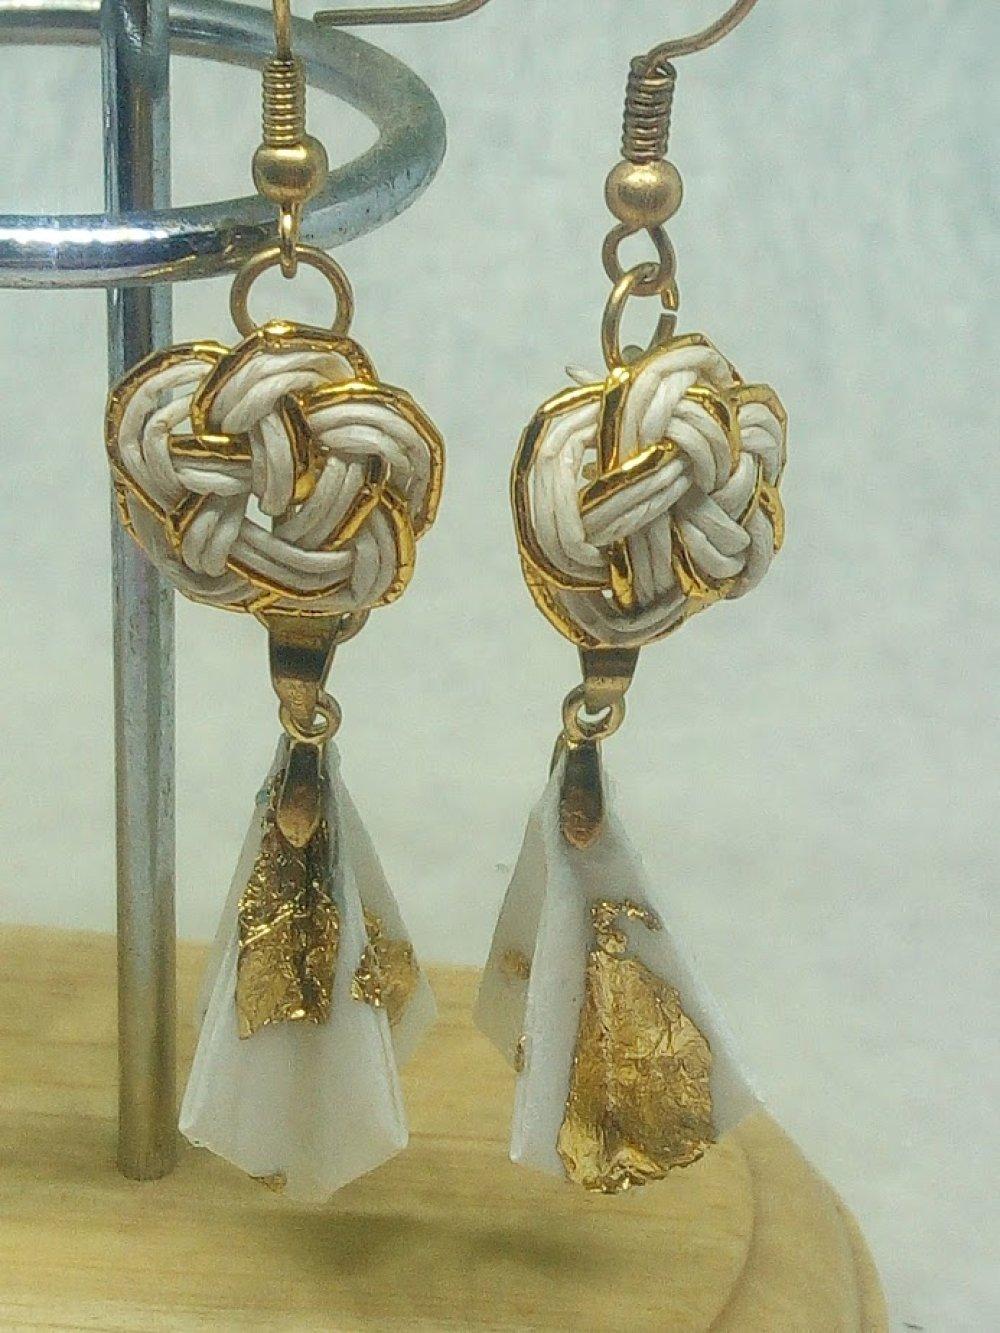 Boucles d'oreilles en Mizuhiki et Origami blanc et or (BDO_MIZ_001)